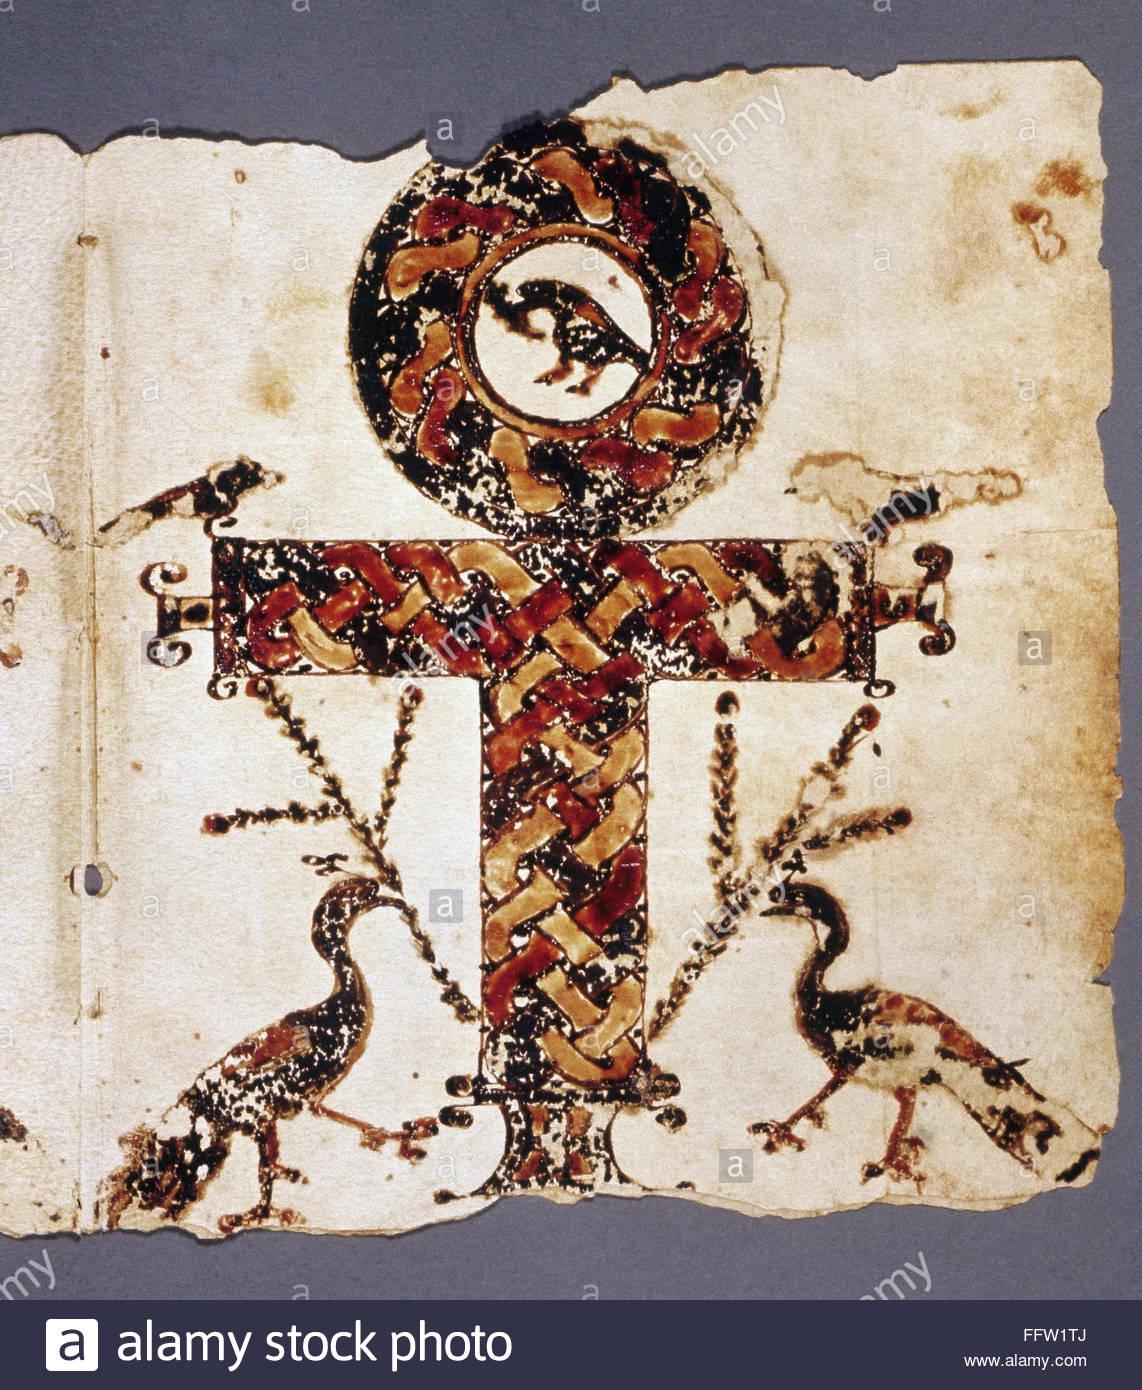 coptic-cross-nansate-cross-with-birds-illumination-on-vellum-from-FFW1TJ.jpg